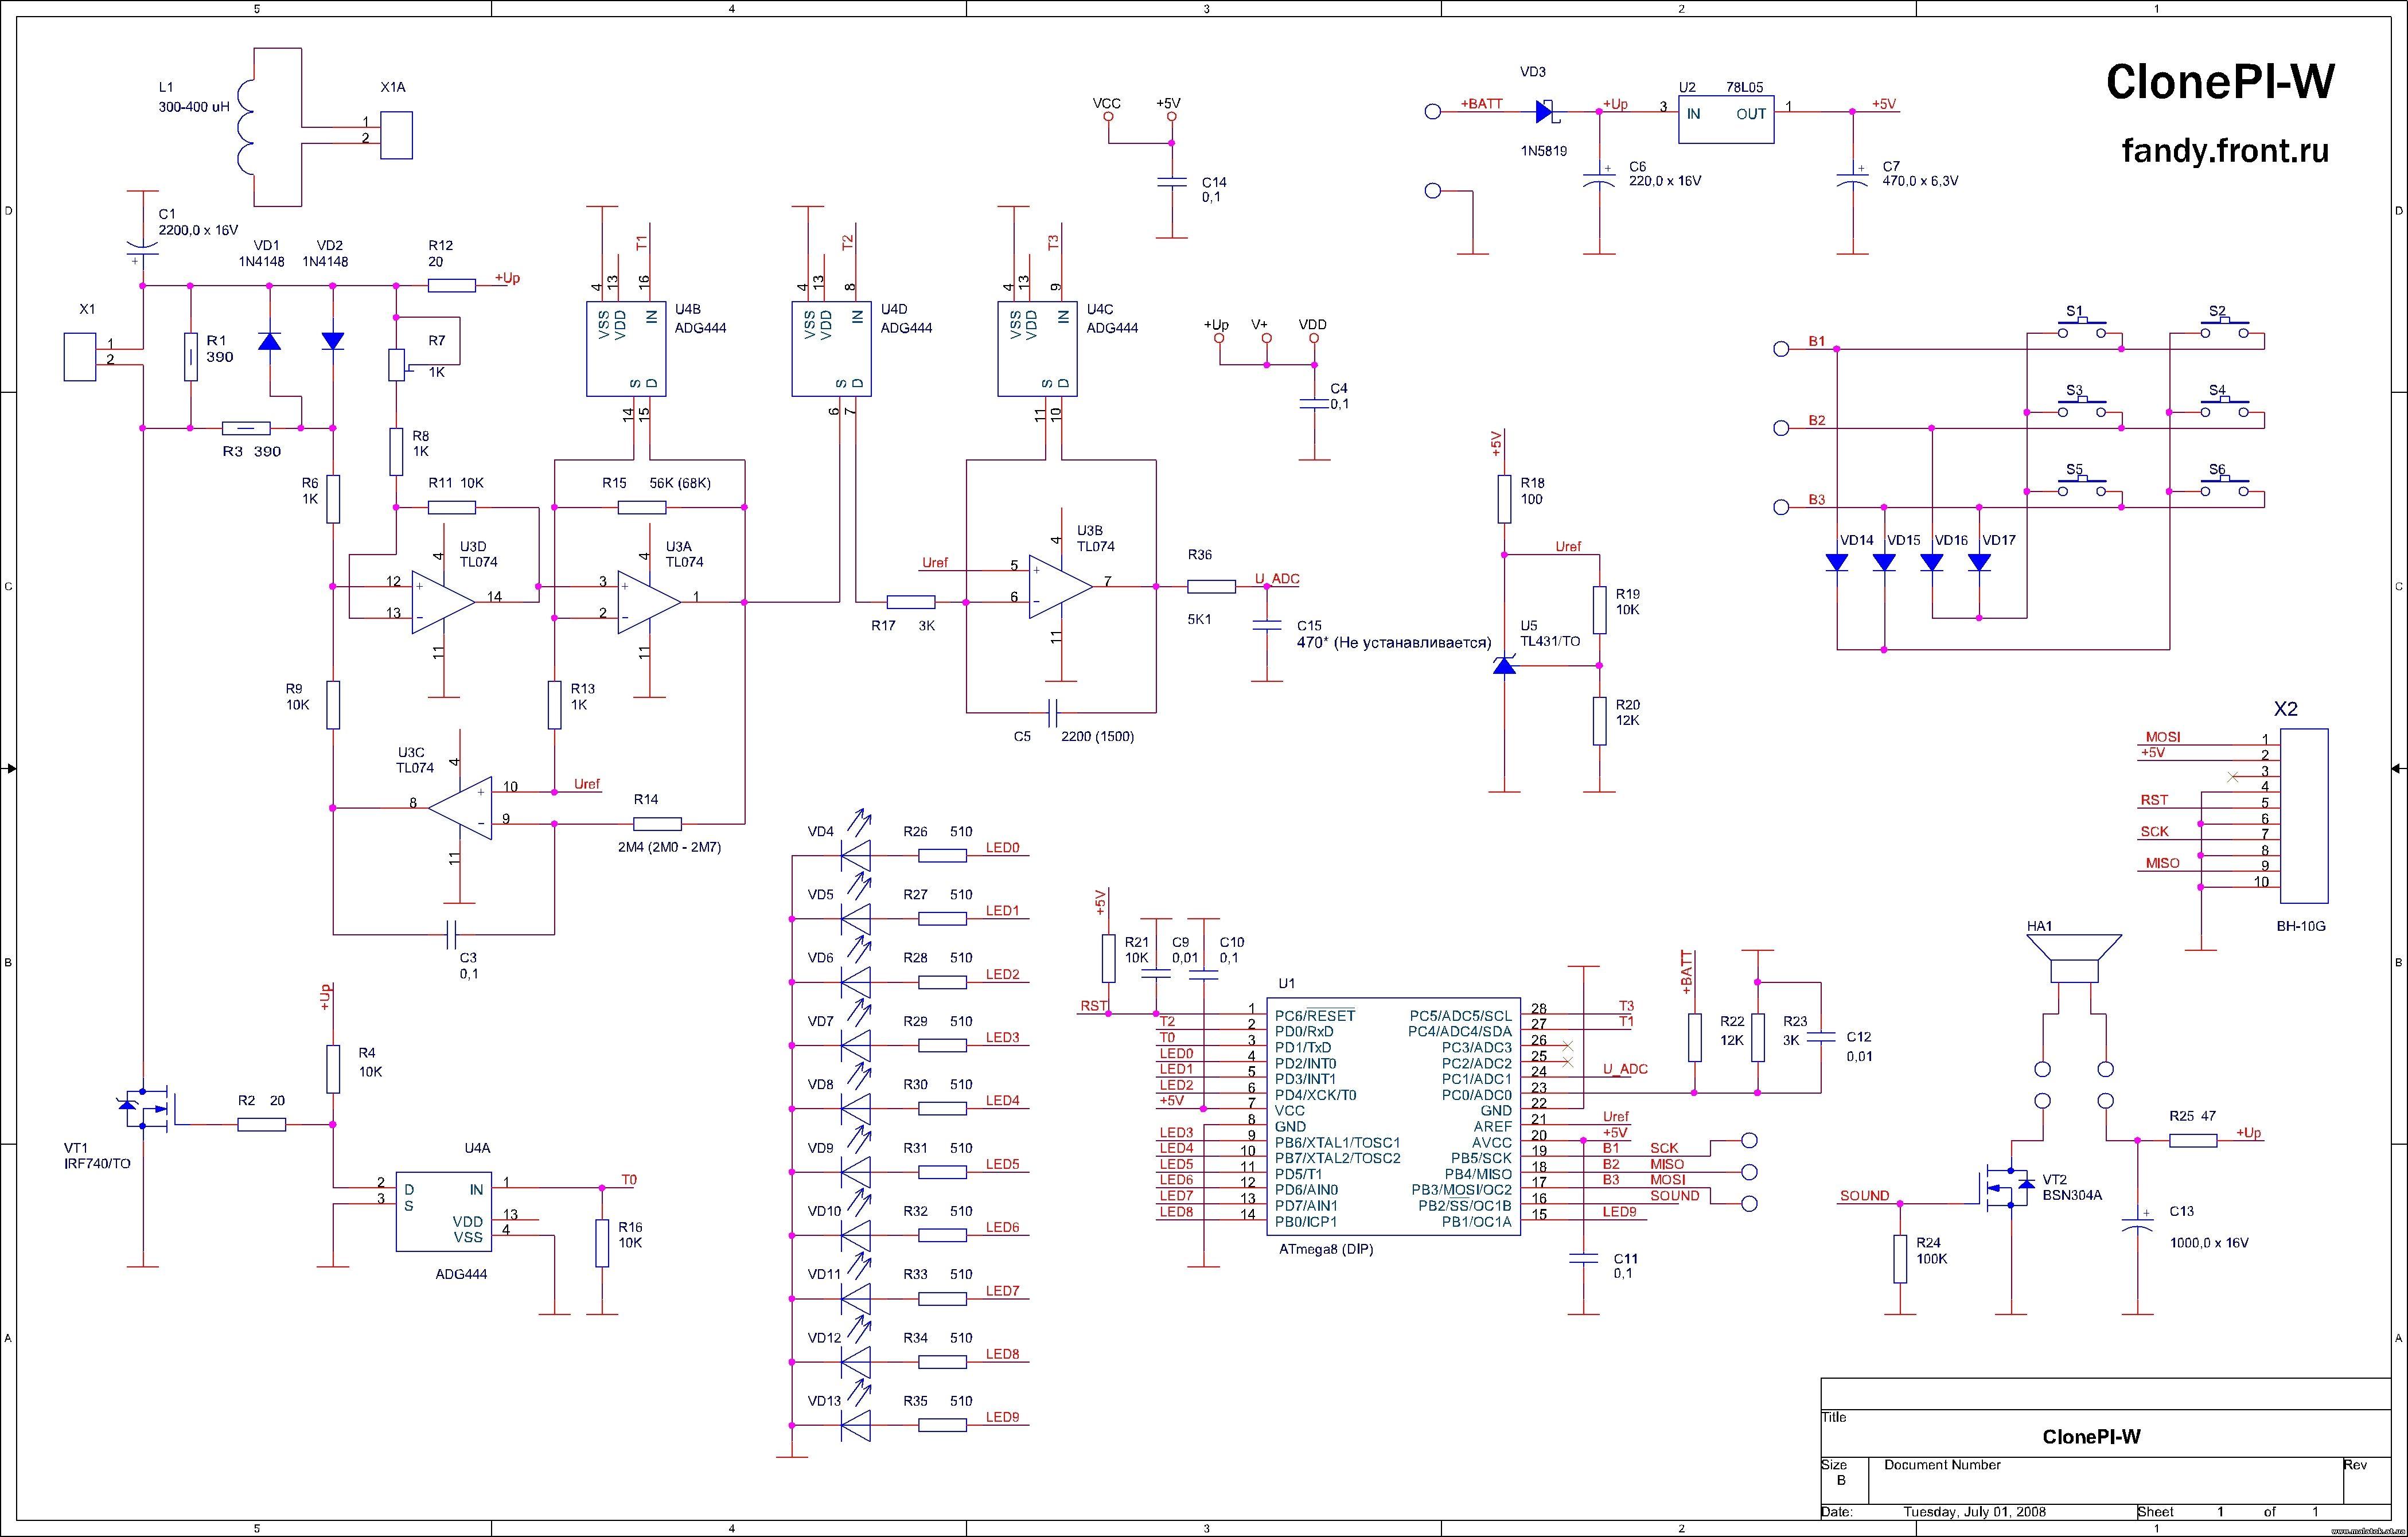 Схема металлодетектора Clone PI W